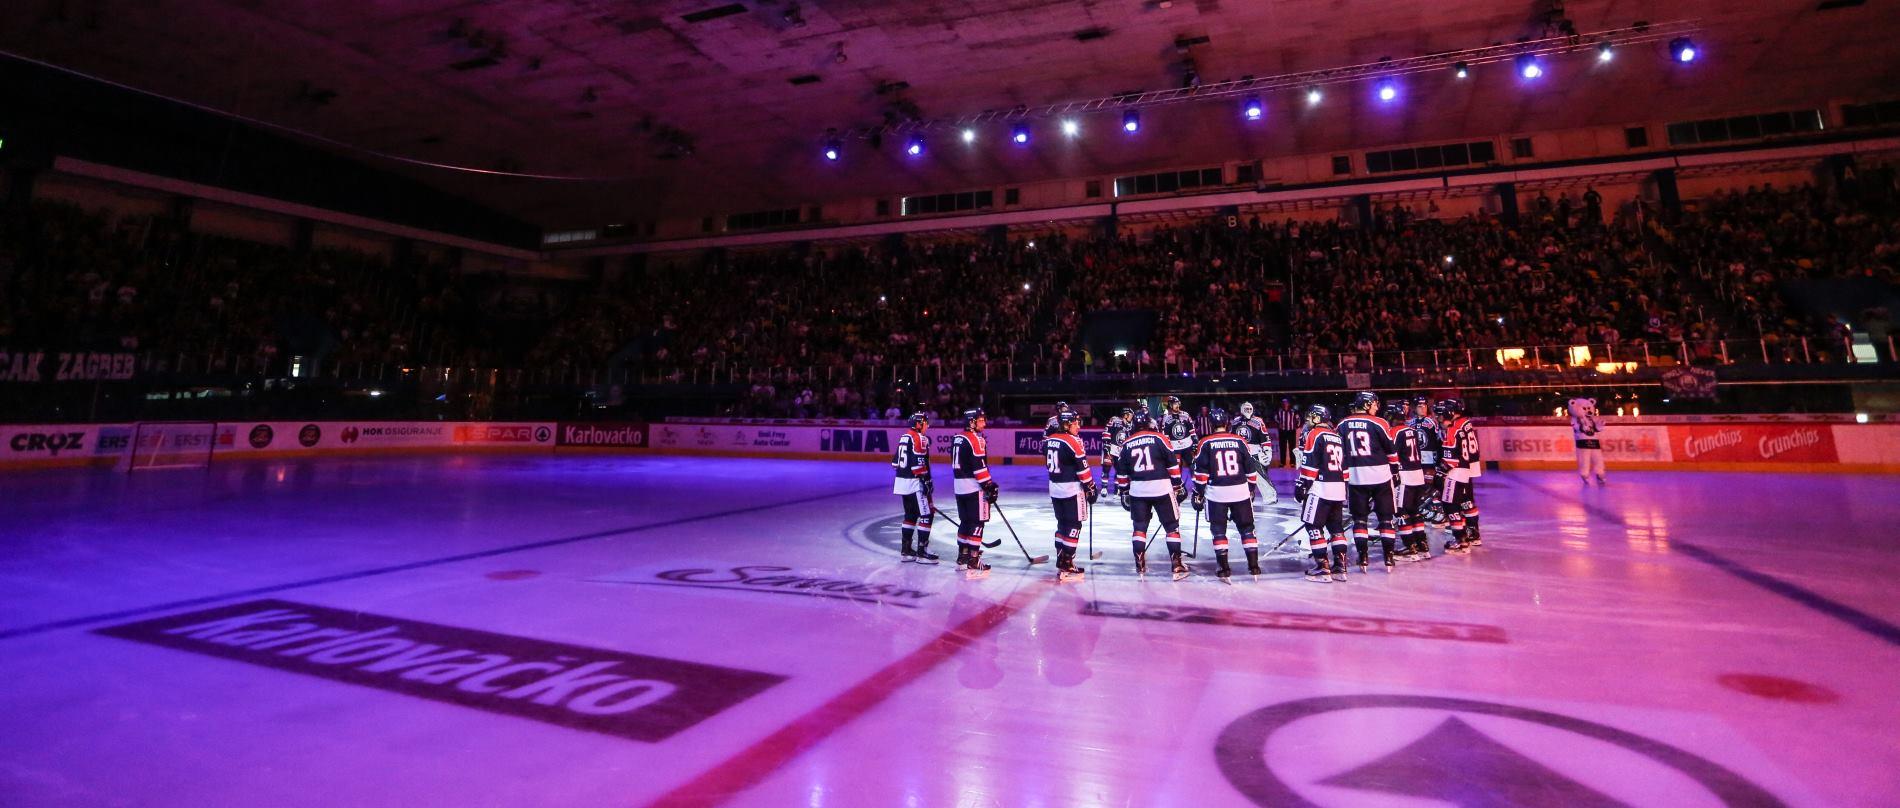 FOTO: Brojni poznati na prvoj domaćoj utakmici KHL Medveščaka